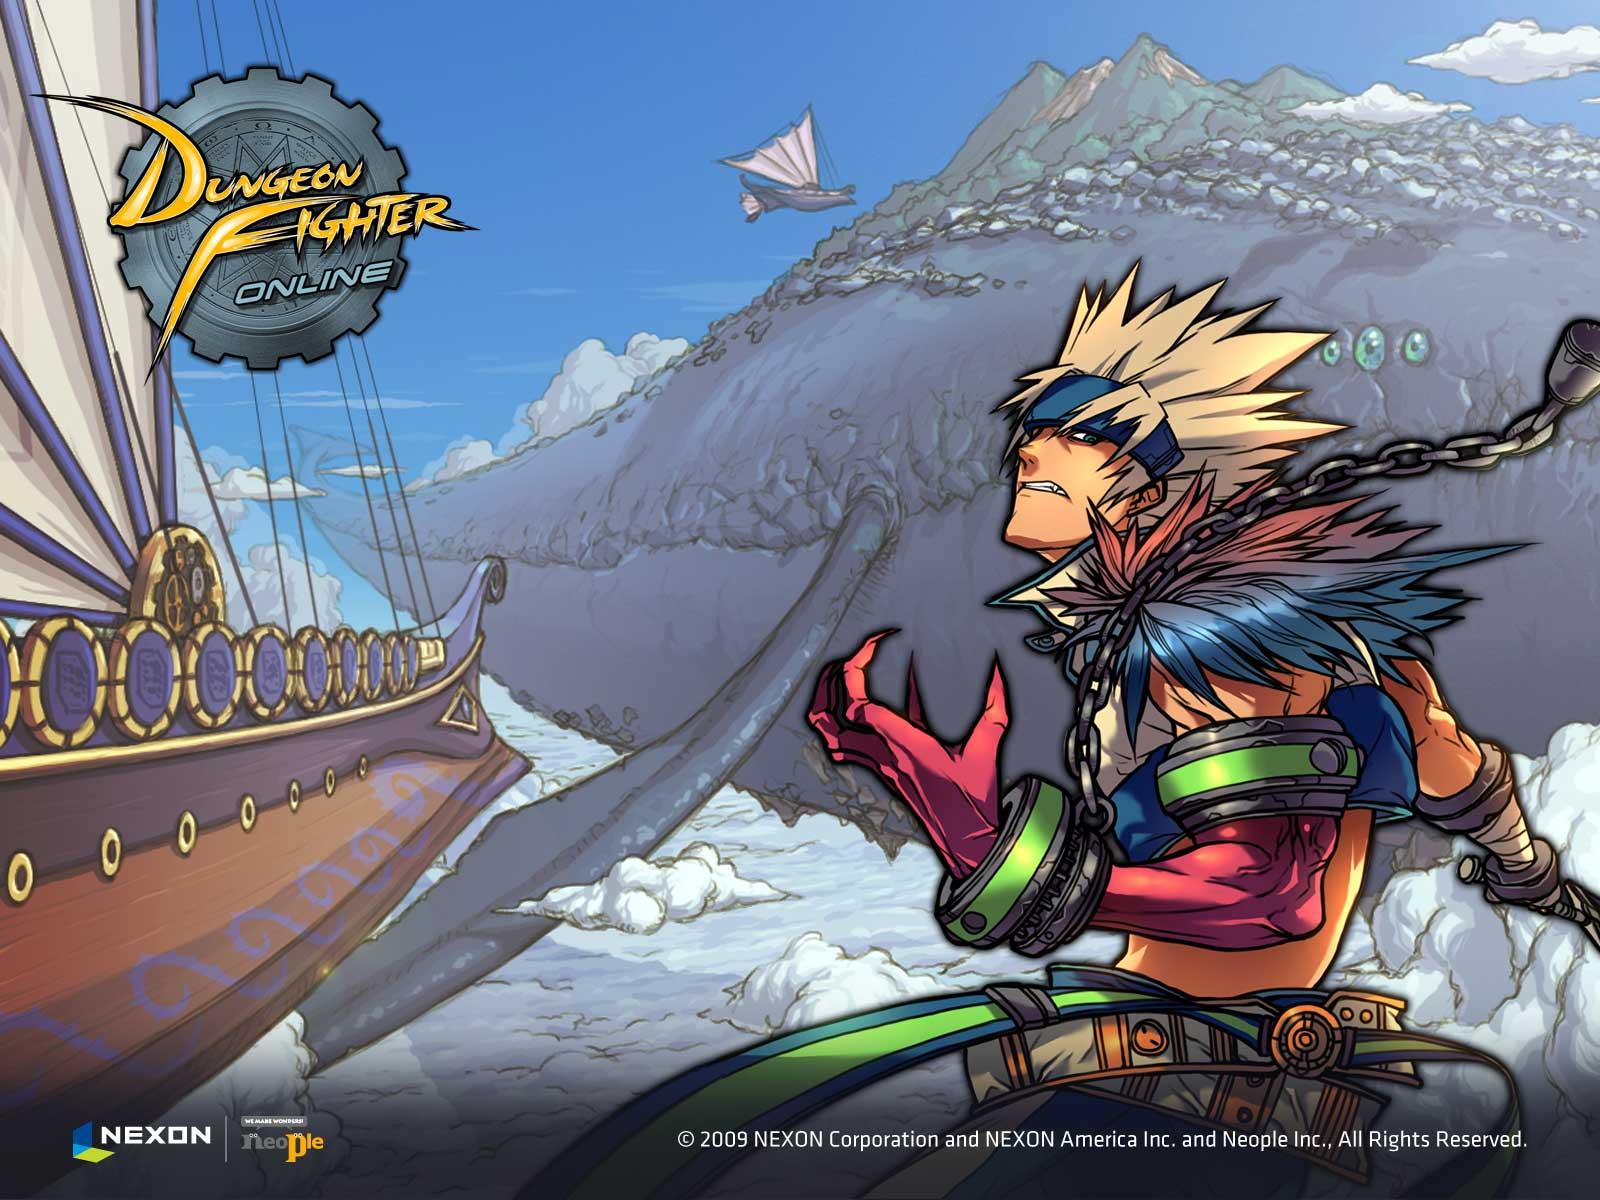 Dungeon Fighter Online Wallpaper 1600x1200